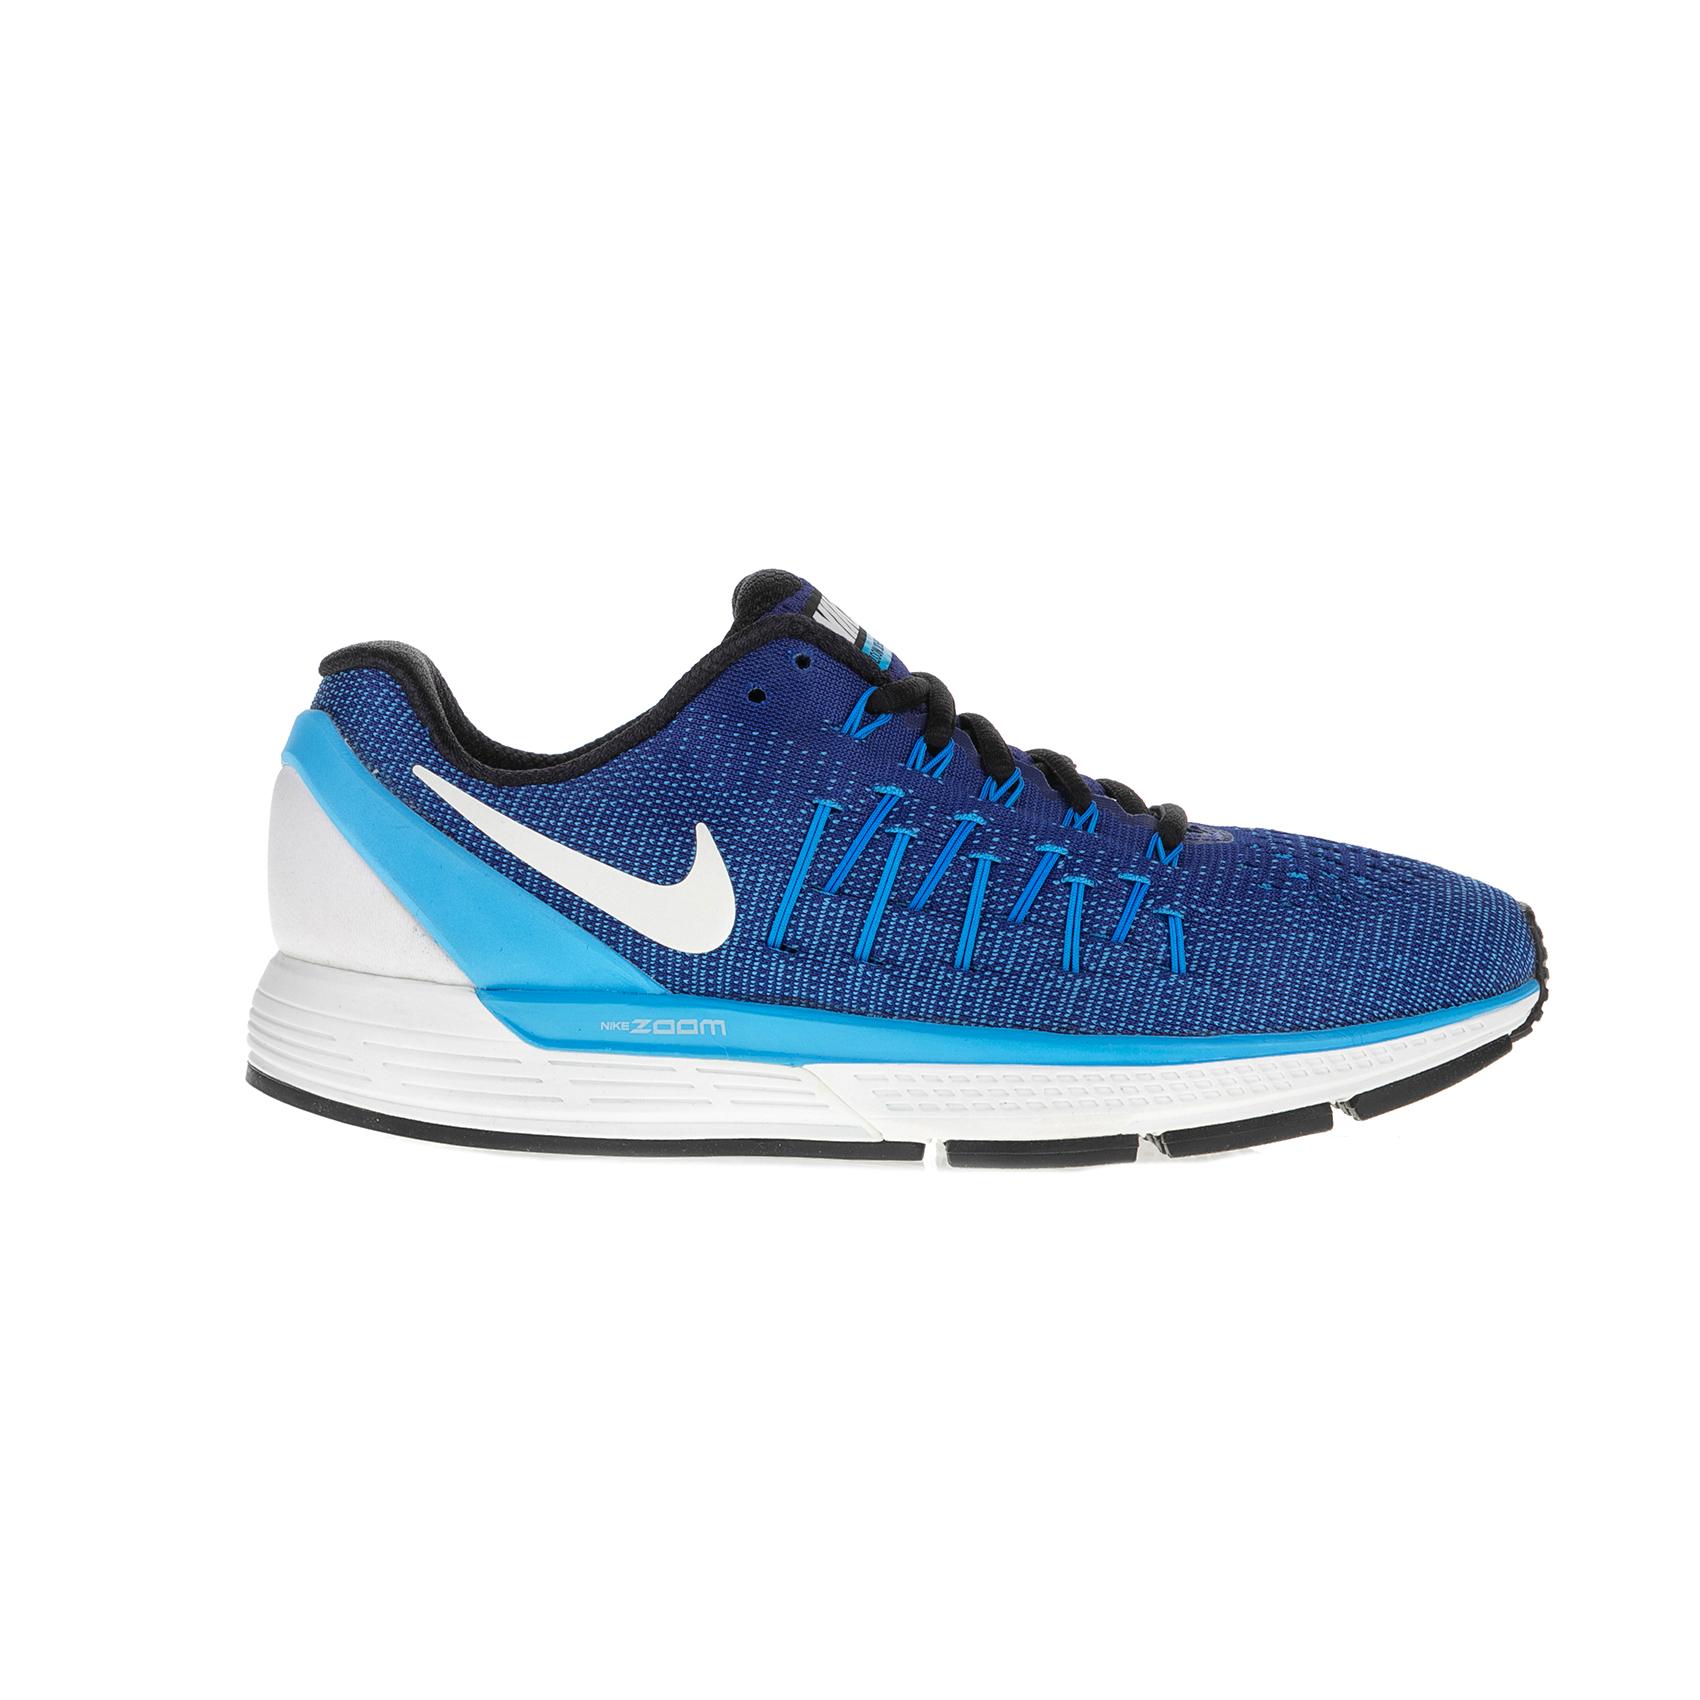 NIKE – Ανδρικά παπούτσια για τρέξιμο Nike AIR ZOOM ODYSSEY 2 μπλε